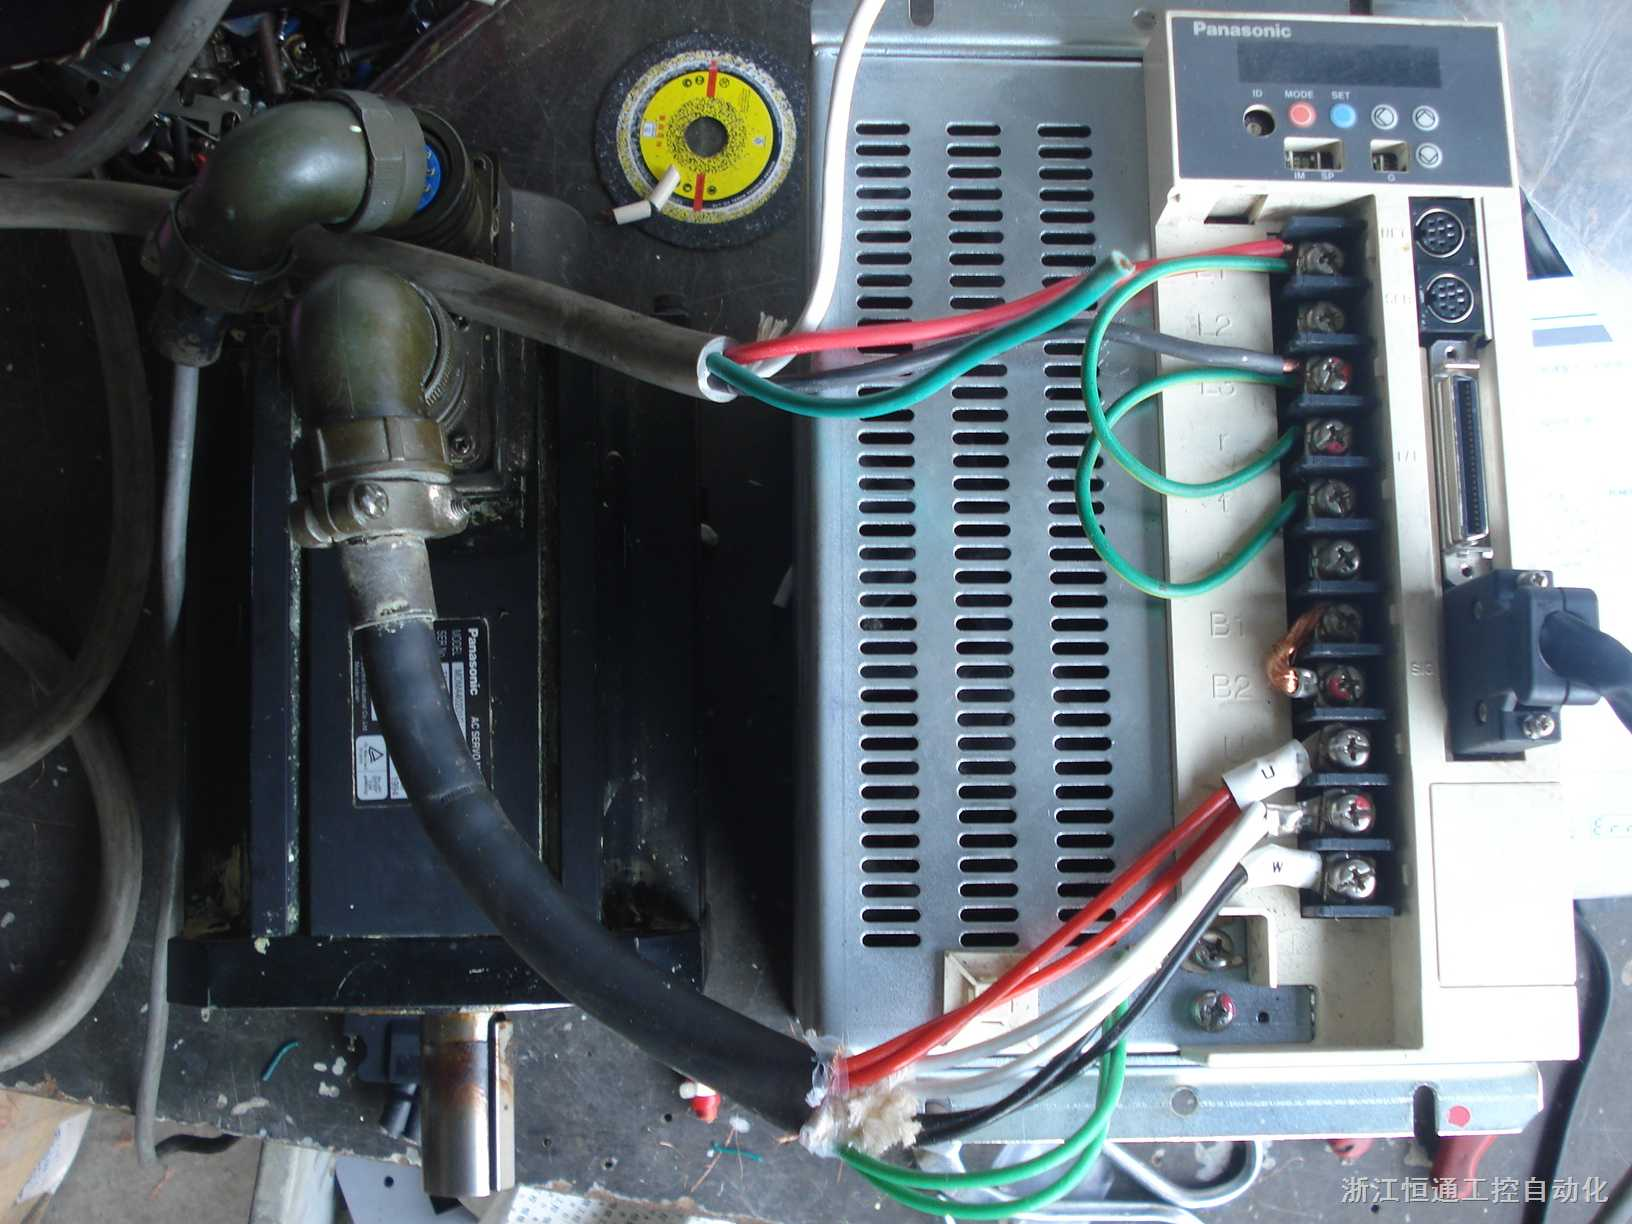 mdda403d1a mdma402d1g-松下伺服电机驱动器 mdda403d